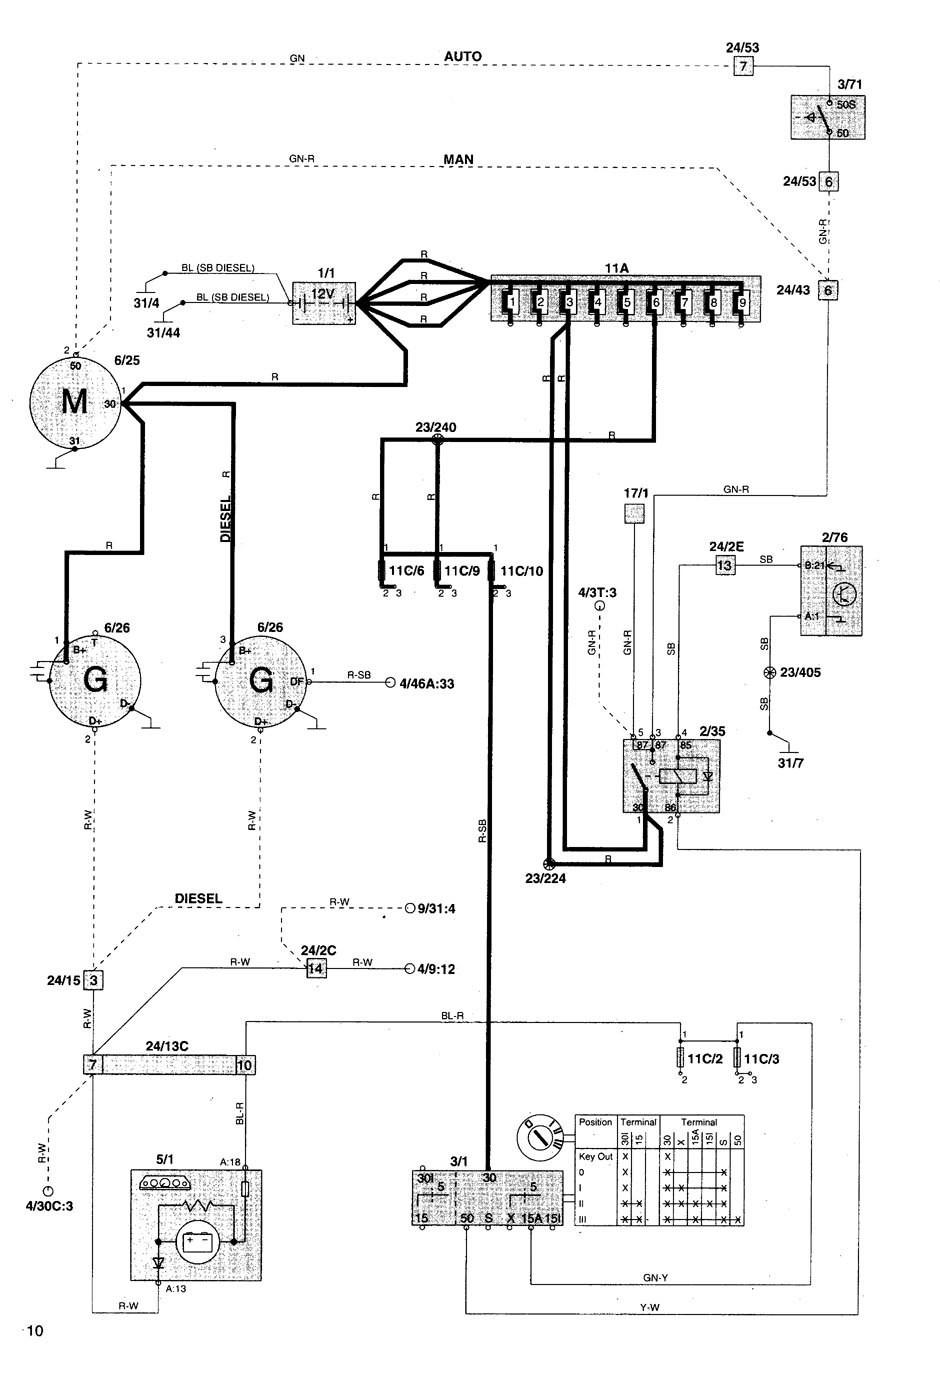 Volvo S80 T6 Complete Engine Wiring Grafik 2000 Volvo S80 T6 Engine Diagram Hd Quality Linkdiagrams Freiheitfuermumia De Of Volvo S80 T6 Complete Engine Wiring